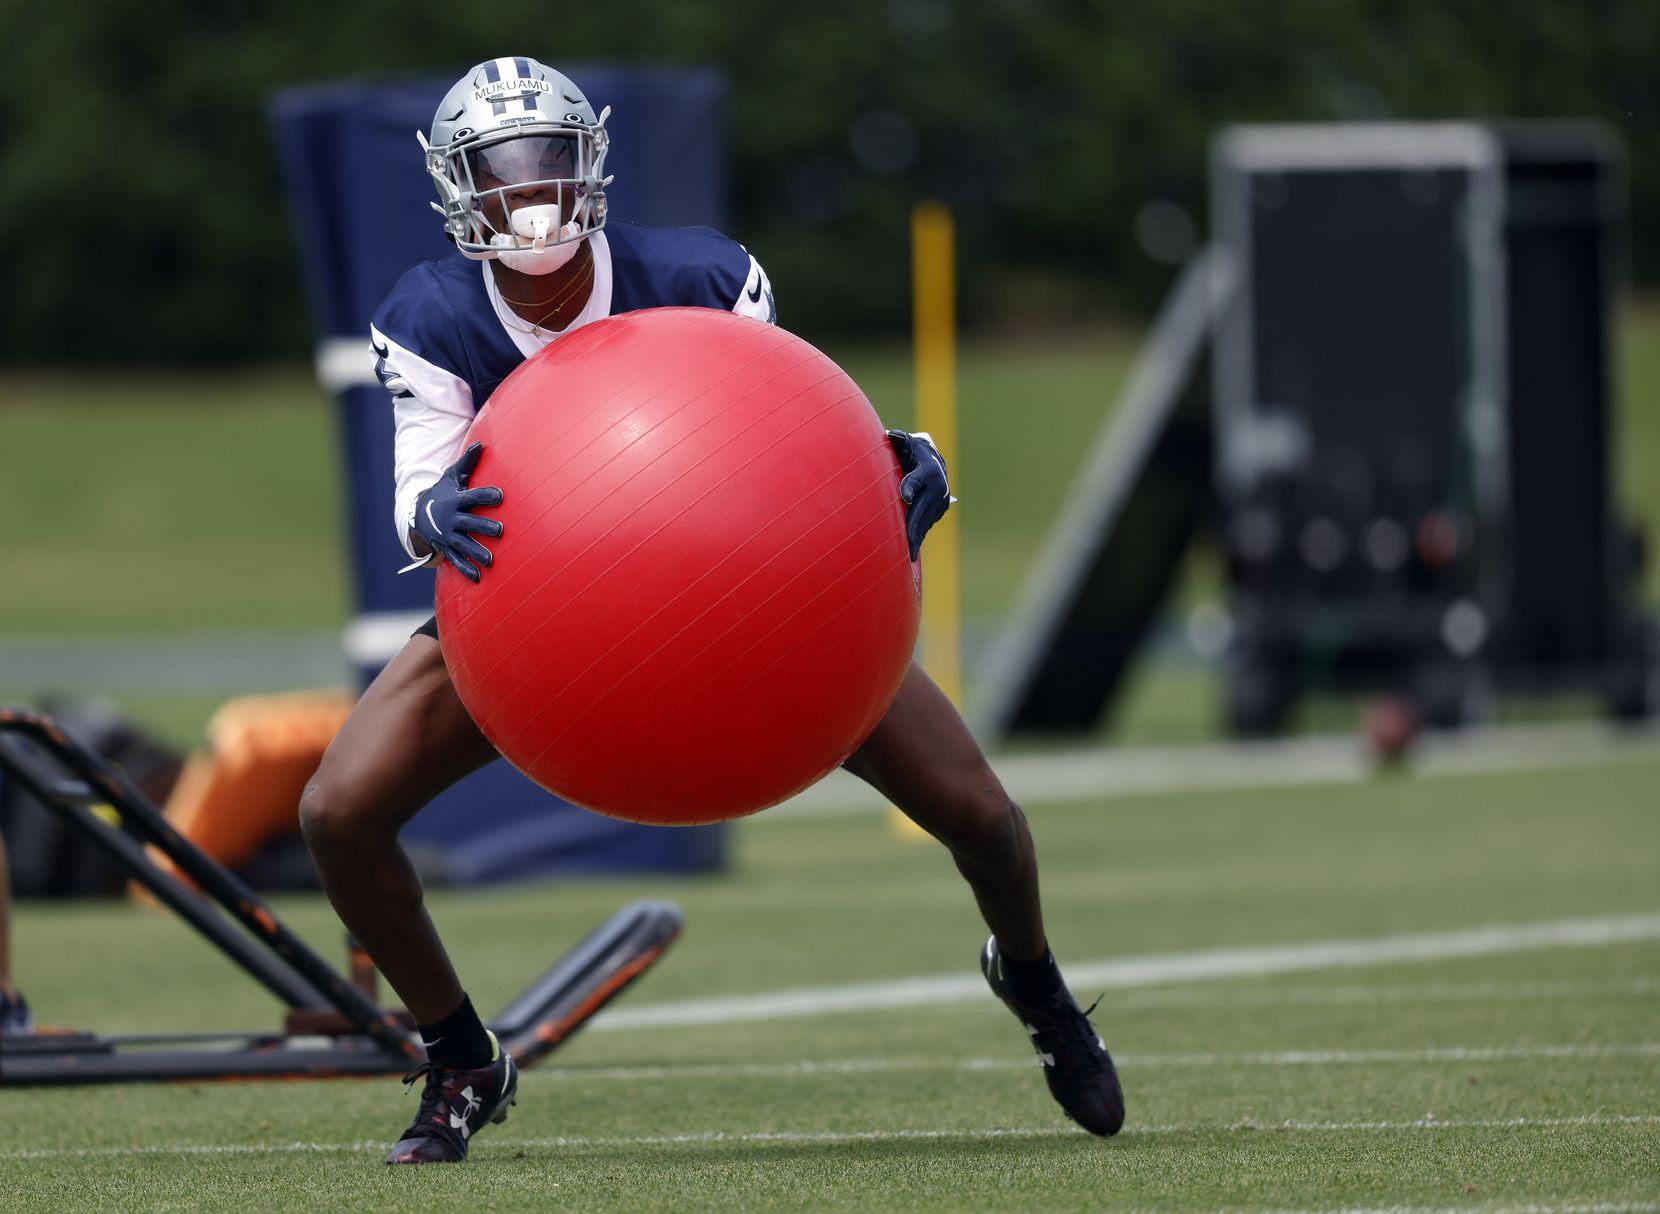 Dallas Cowboys rookie cornerback Israel Mukuamu (38) runs through drills at rookie minicamp at the The Star in Frisco, Texas, Friday, May 14, 2021. (Tom Fox/The Dallas Morning News)